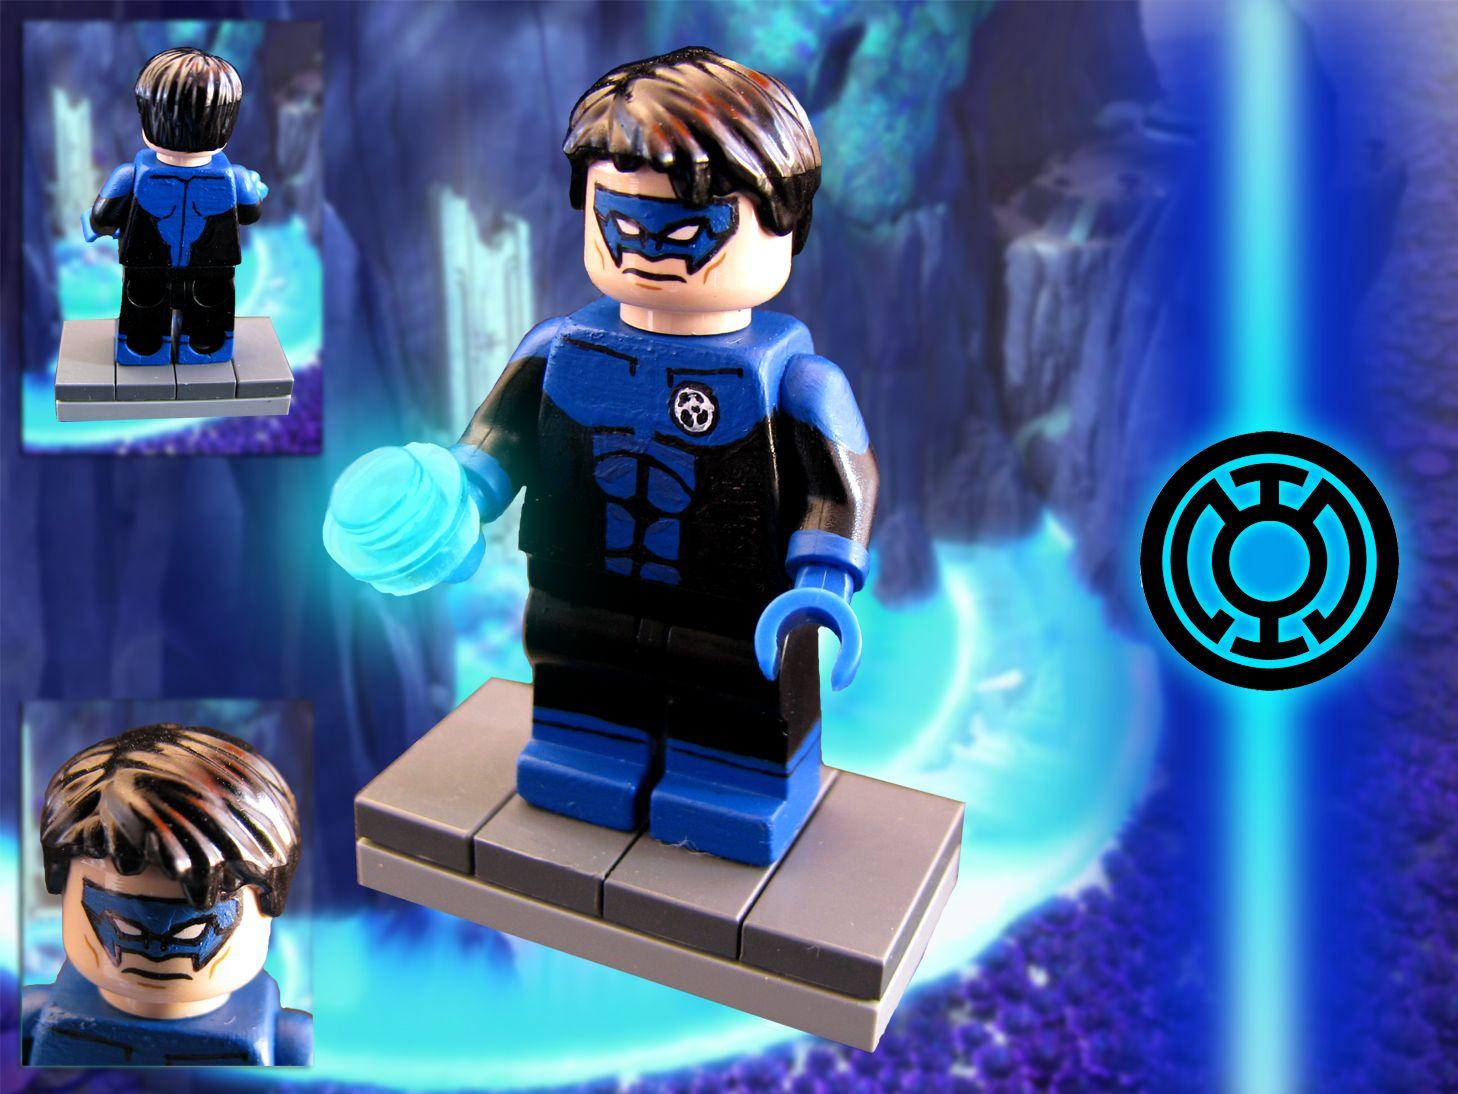 Lego LAIRA OMOTO Custom Printed Minifig DC Superhero Green Lantern New Earth